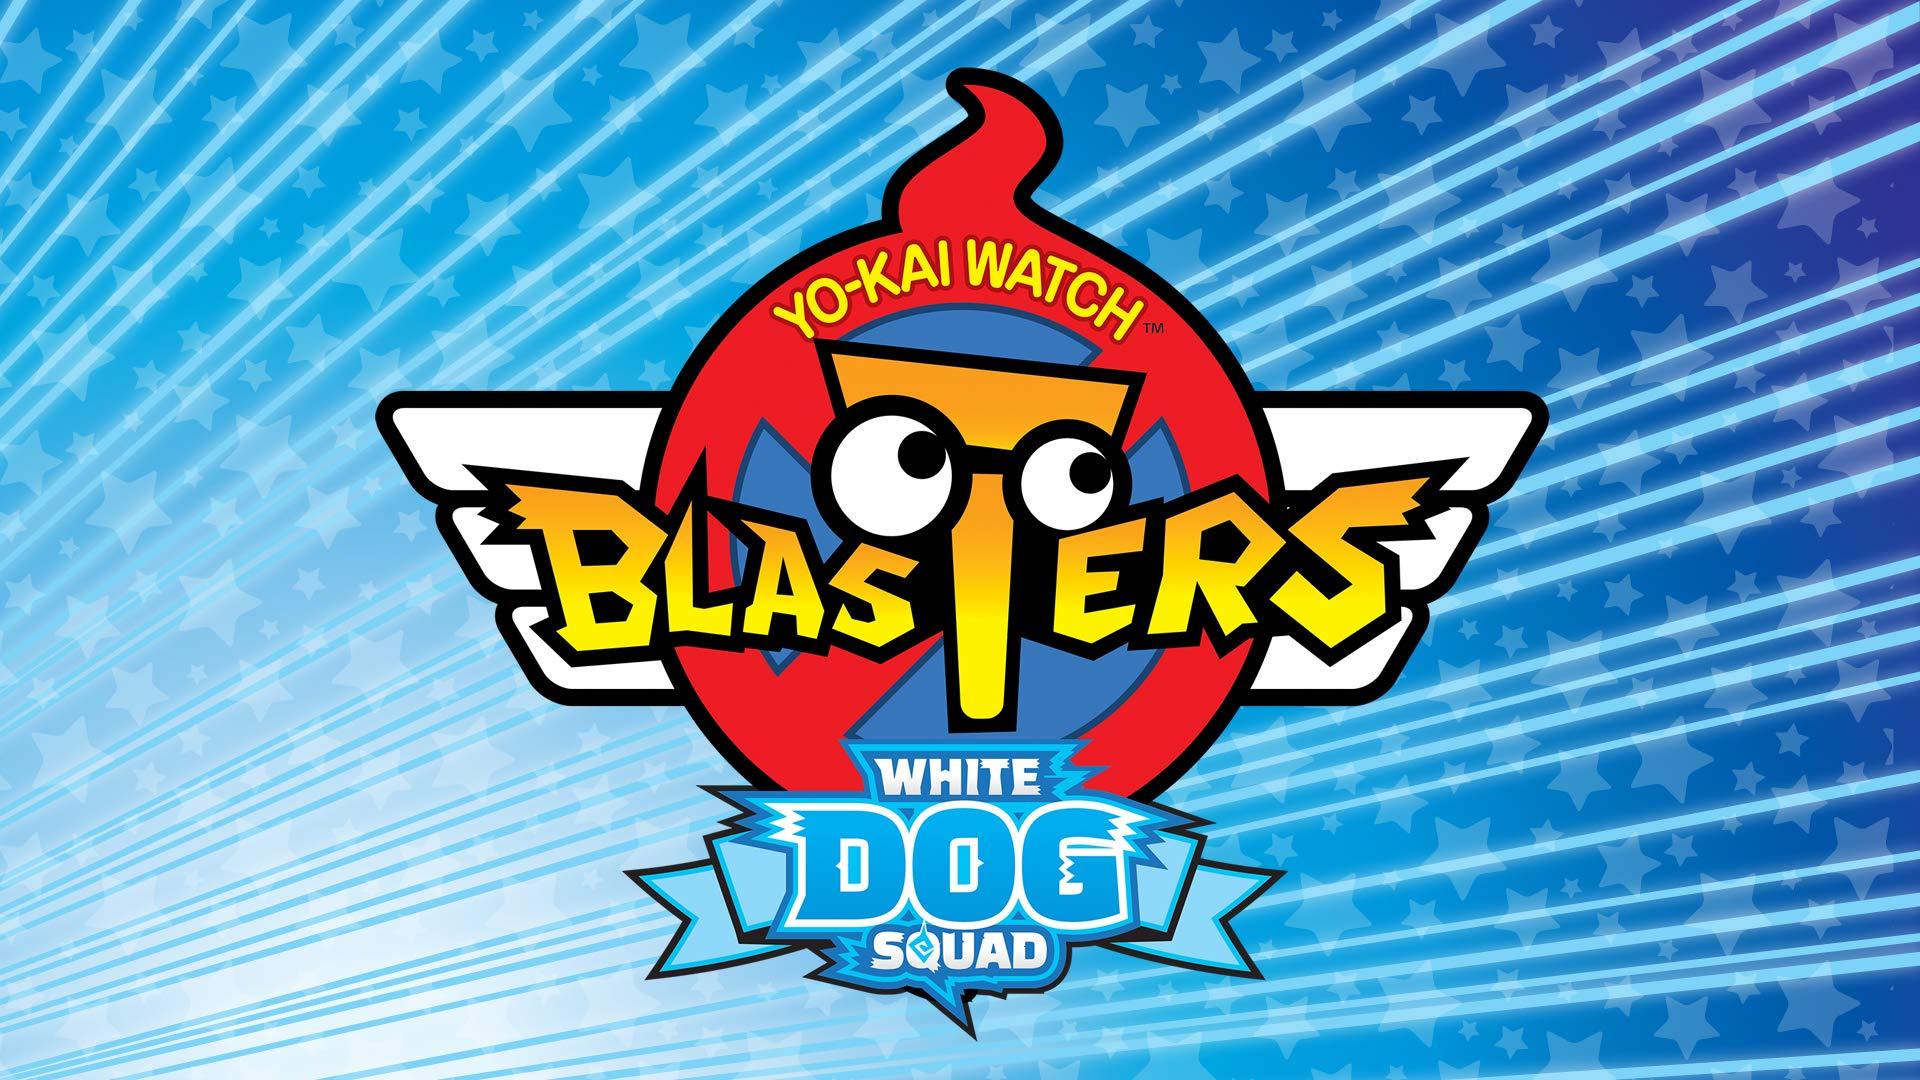 YO-KAI WATCH Blasters: White Dog Squad - DLG - 3DS [Digital Code]